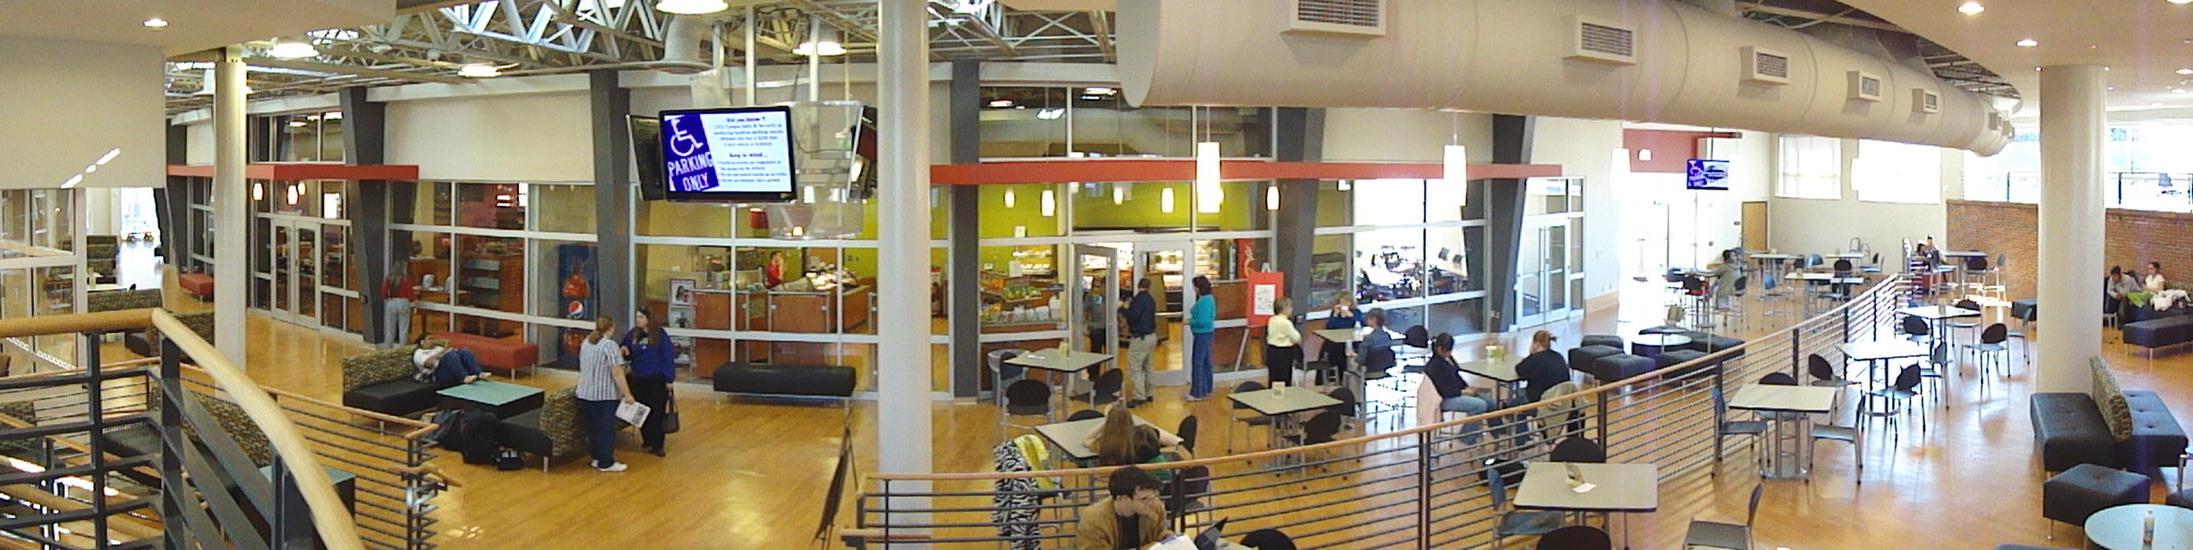 ADW-Higher-Education-CVCC-Hickory-NC-Student-Center-Interior-Long.JPG